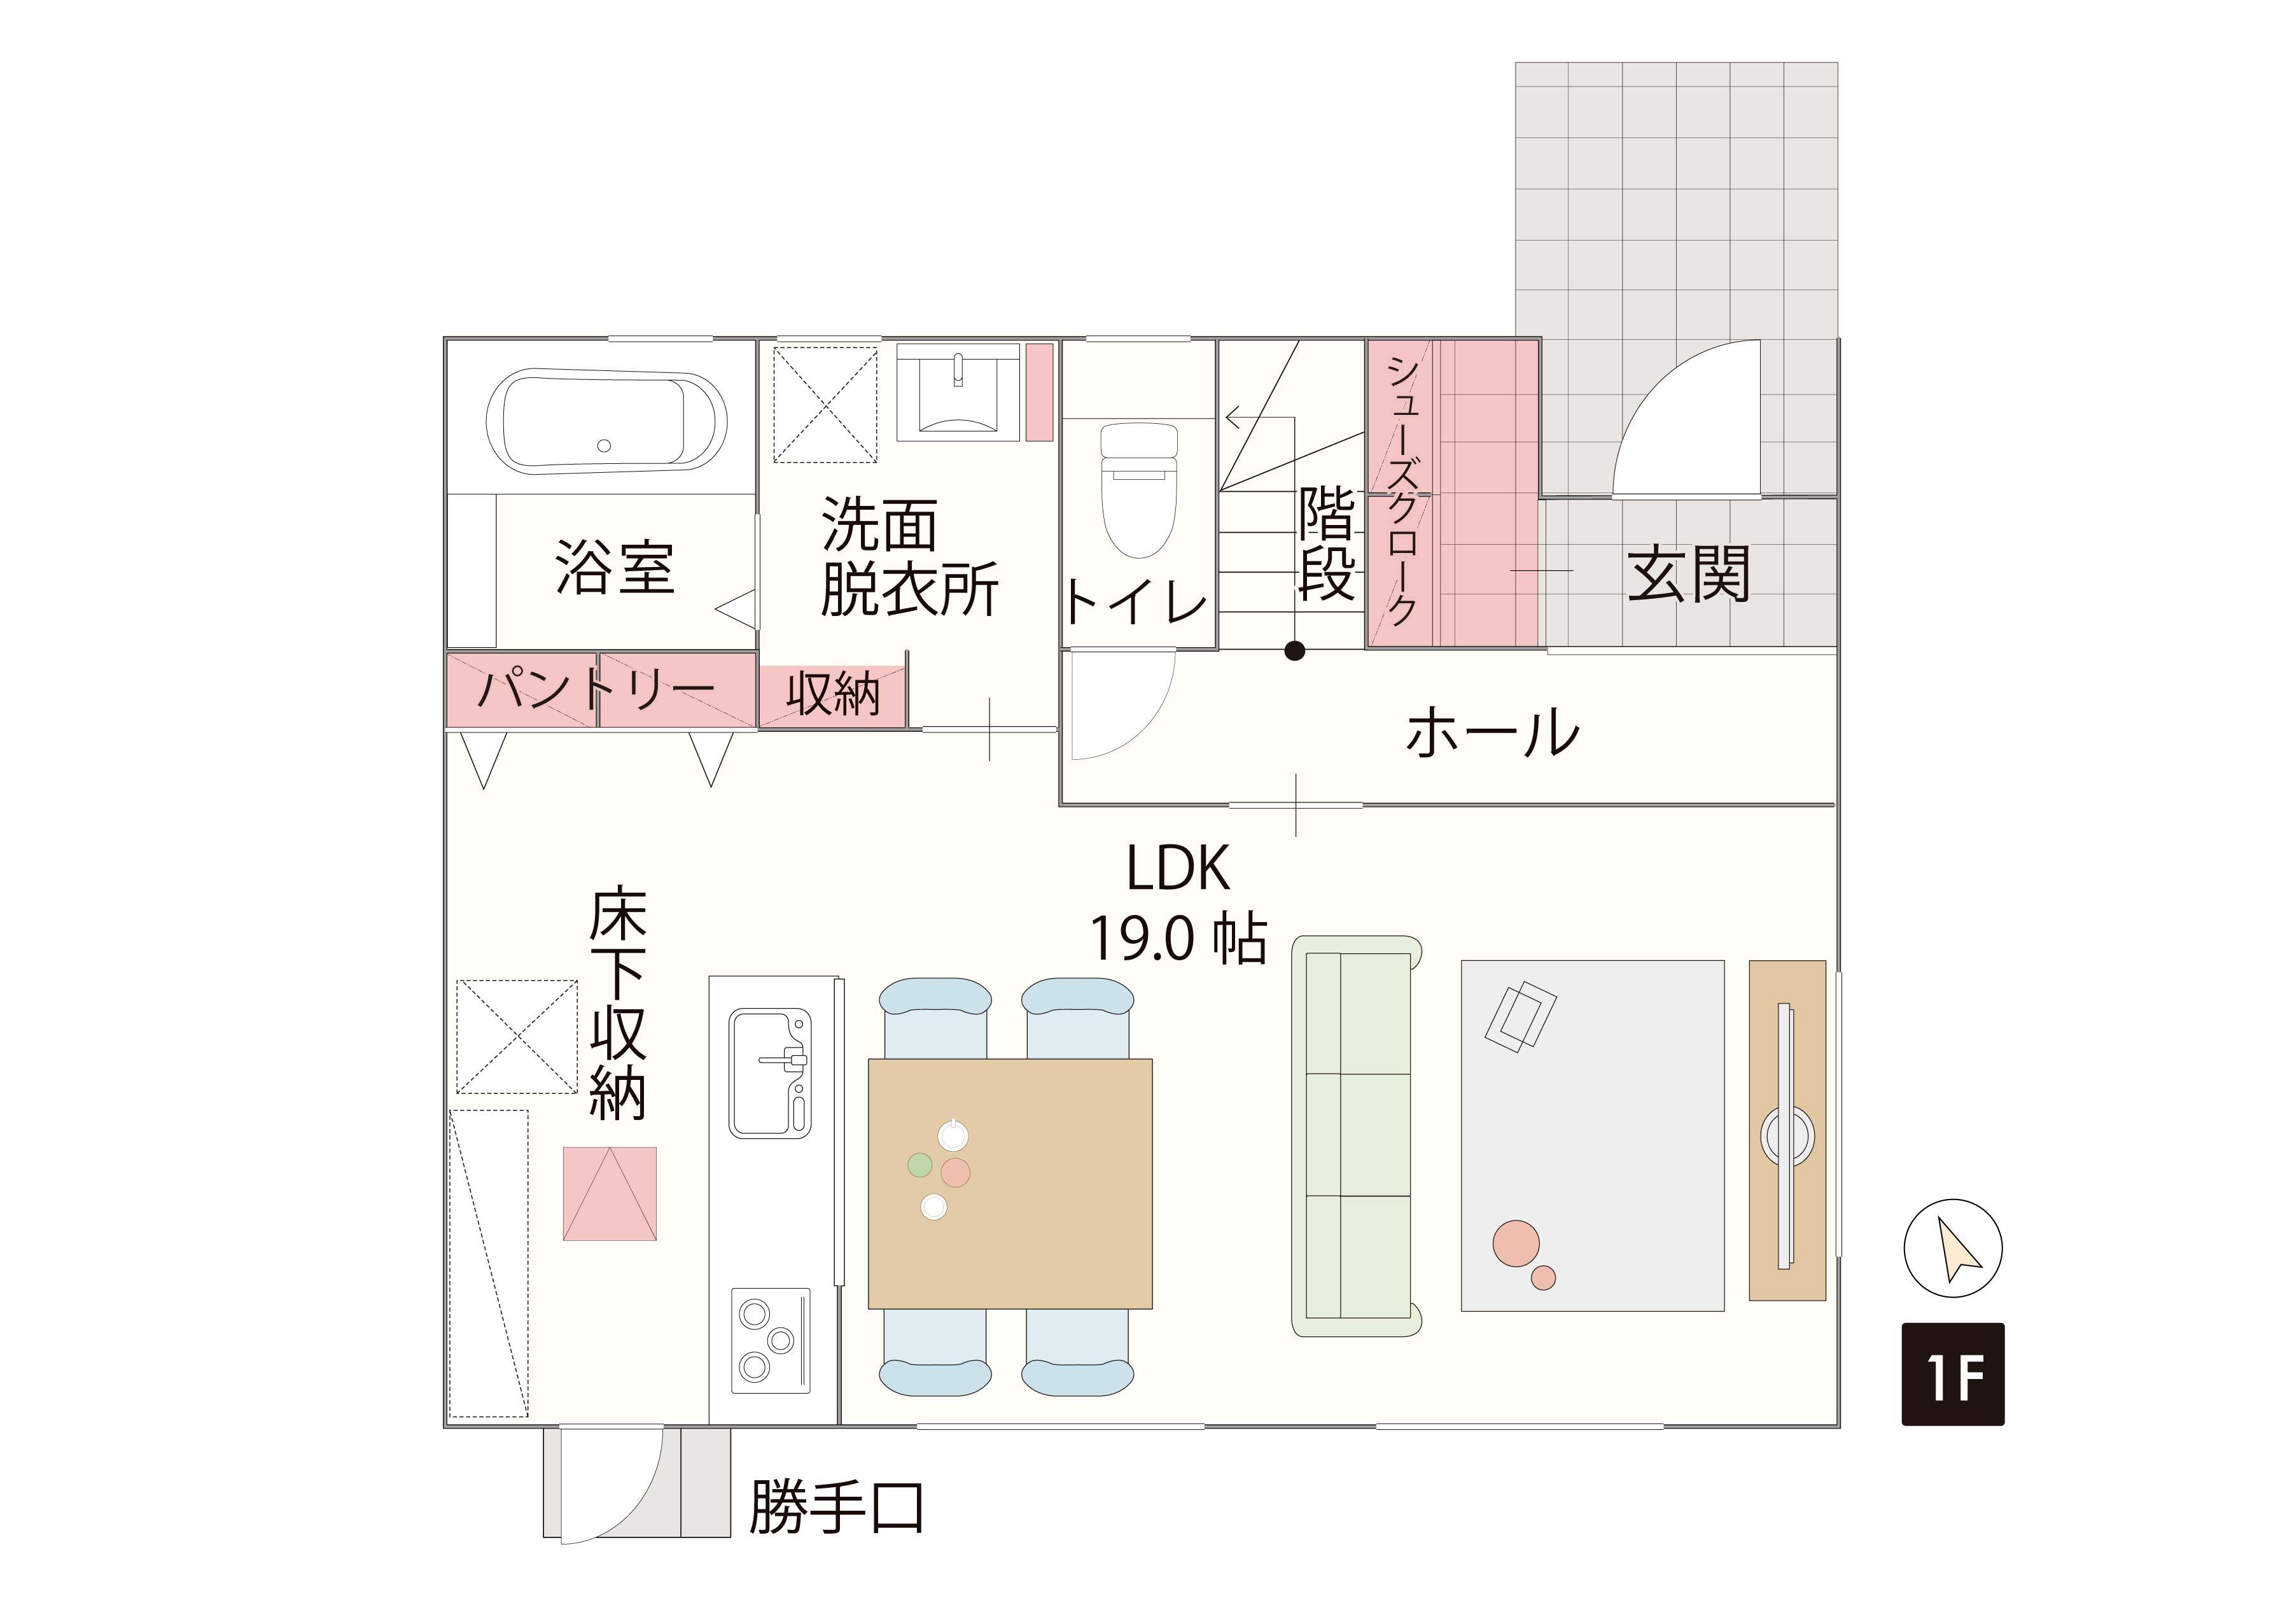 福岡市東区舞松原(限定1棟) 1F間取り